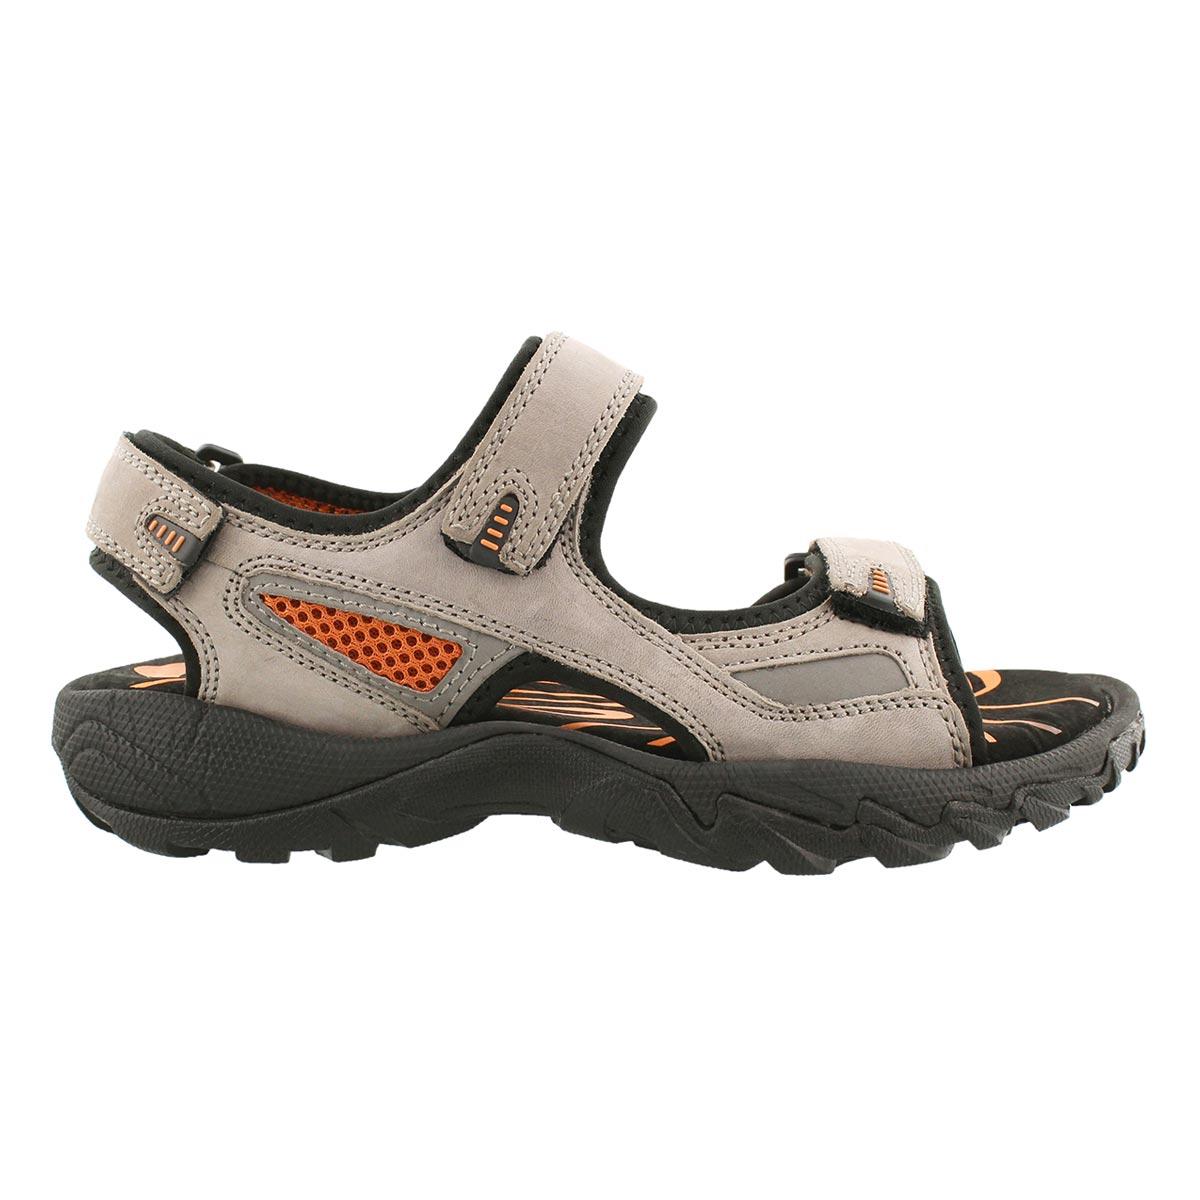 Mns Lucius grey 3 strap sandal